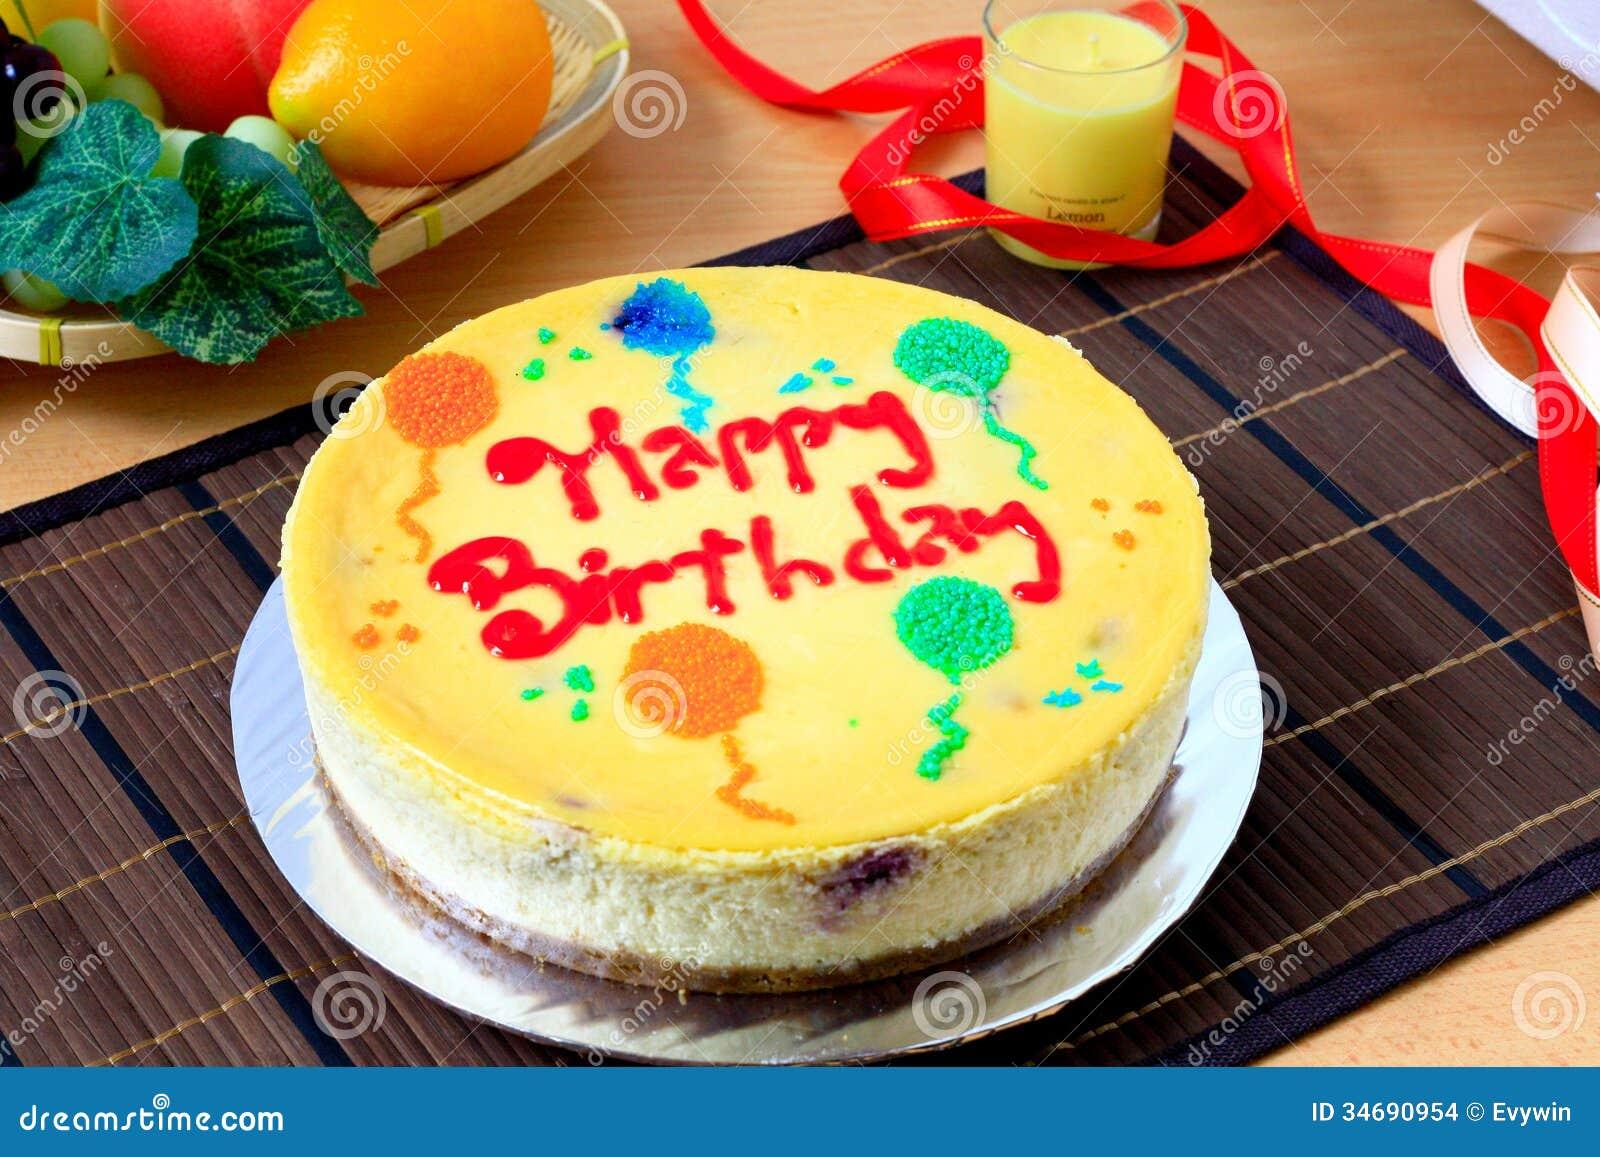 Cheese cake as birthday cake